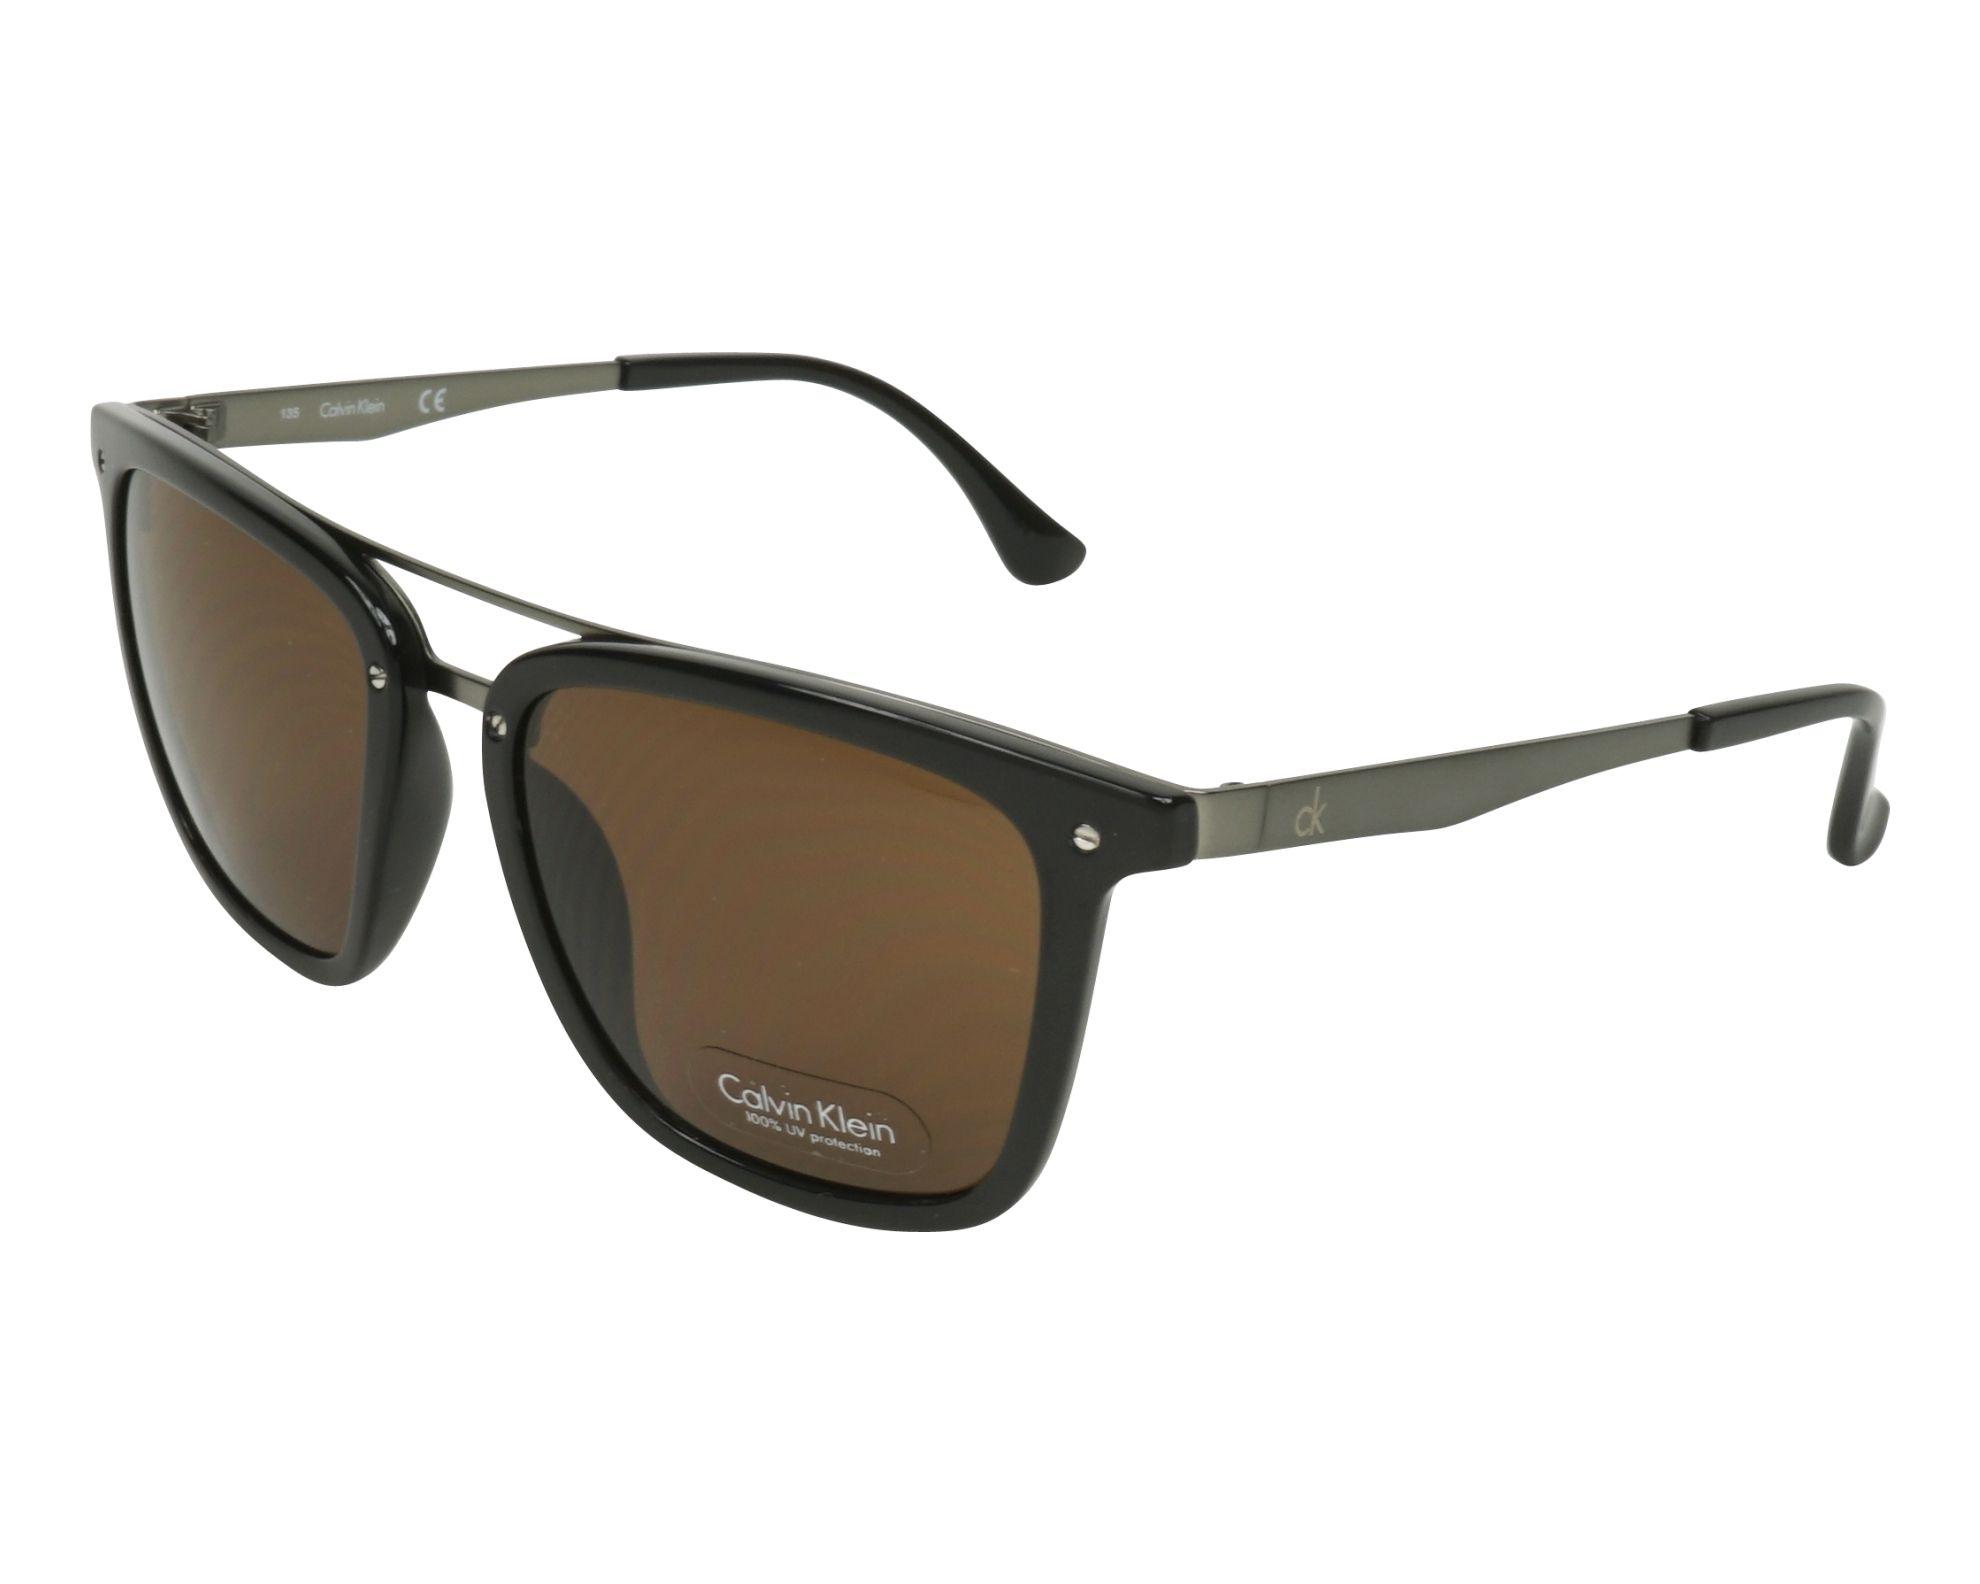 acheter des lunettes de soleil calvin klein ck 1214 s 001 visionet. Black Bedroom Furniture Sets. Home Design Ideas